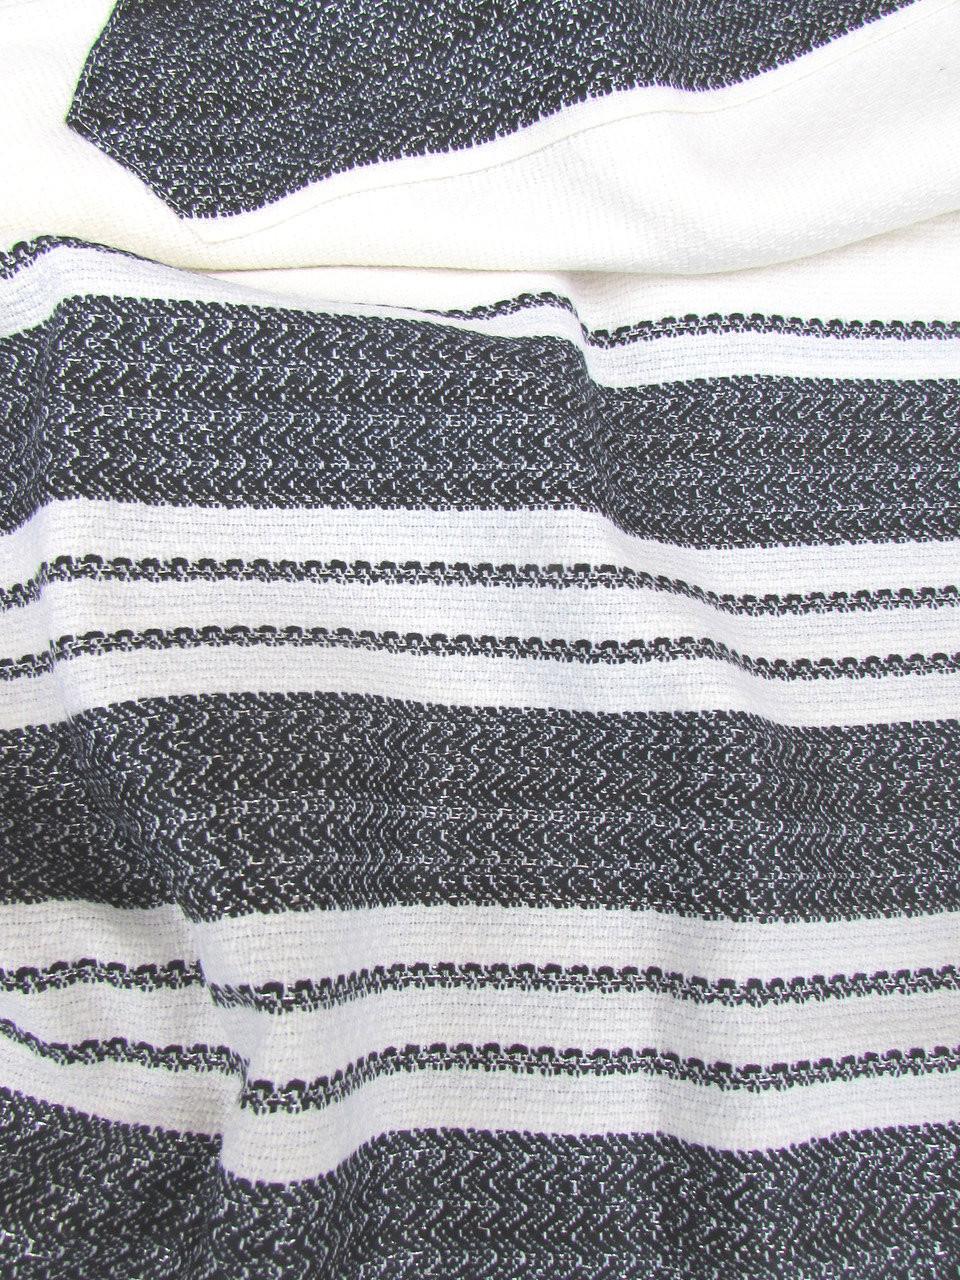 Carmel Black-Silver Talllit